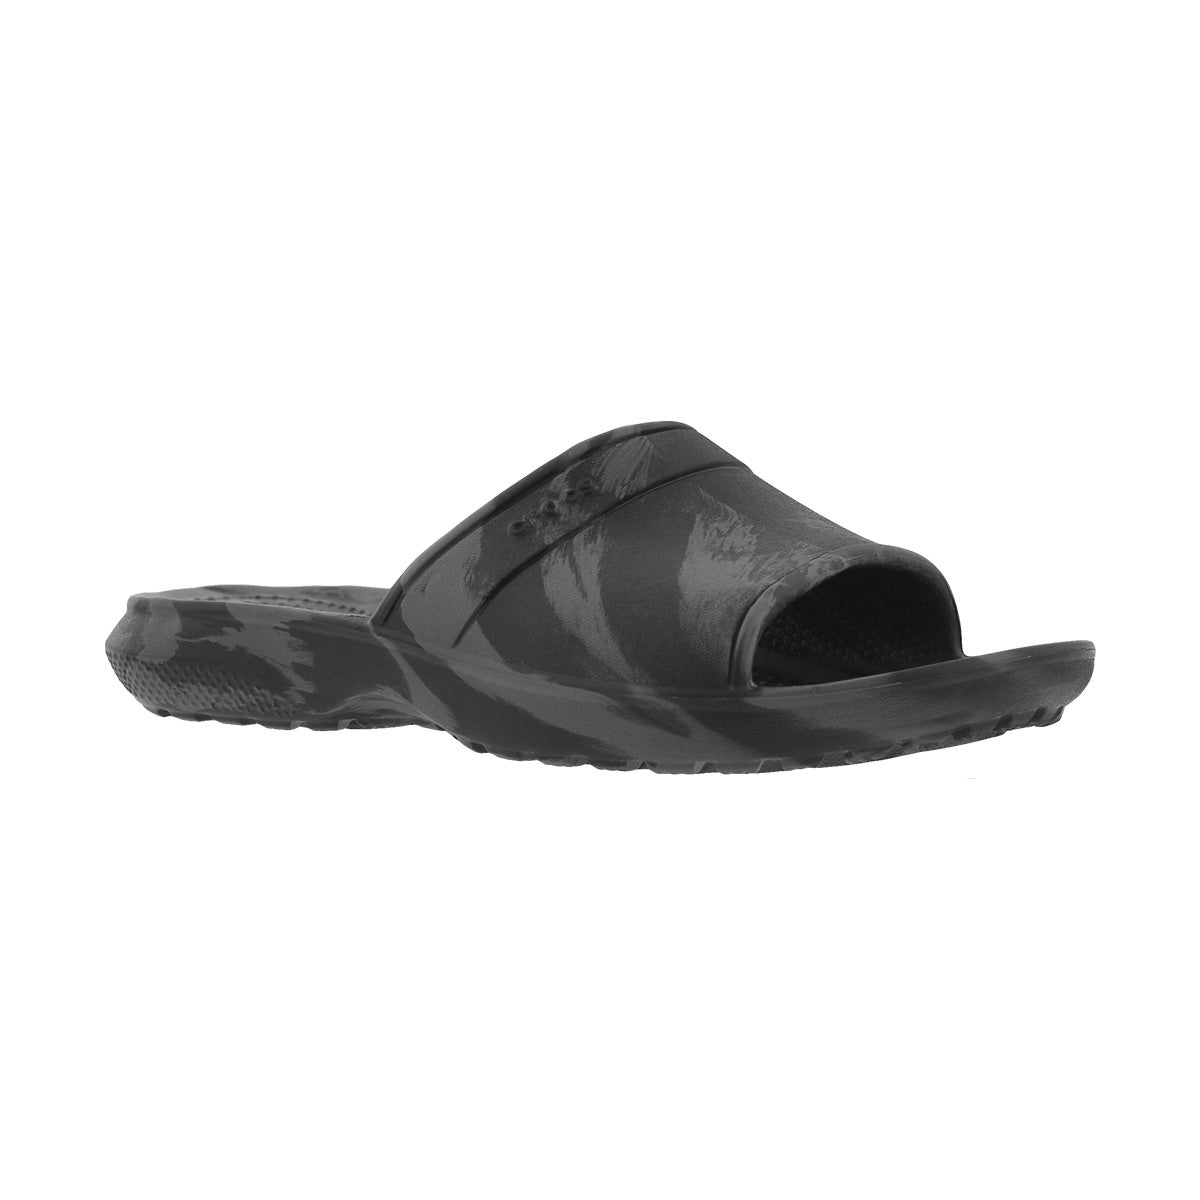 Kids' CLASSIC SWIRL black slide sandals